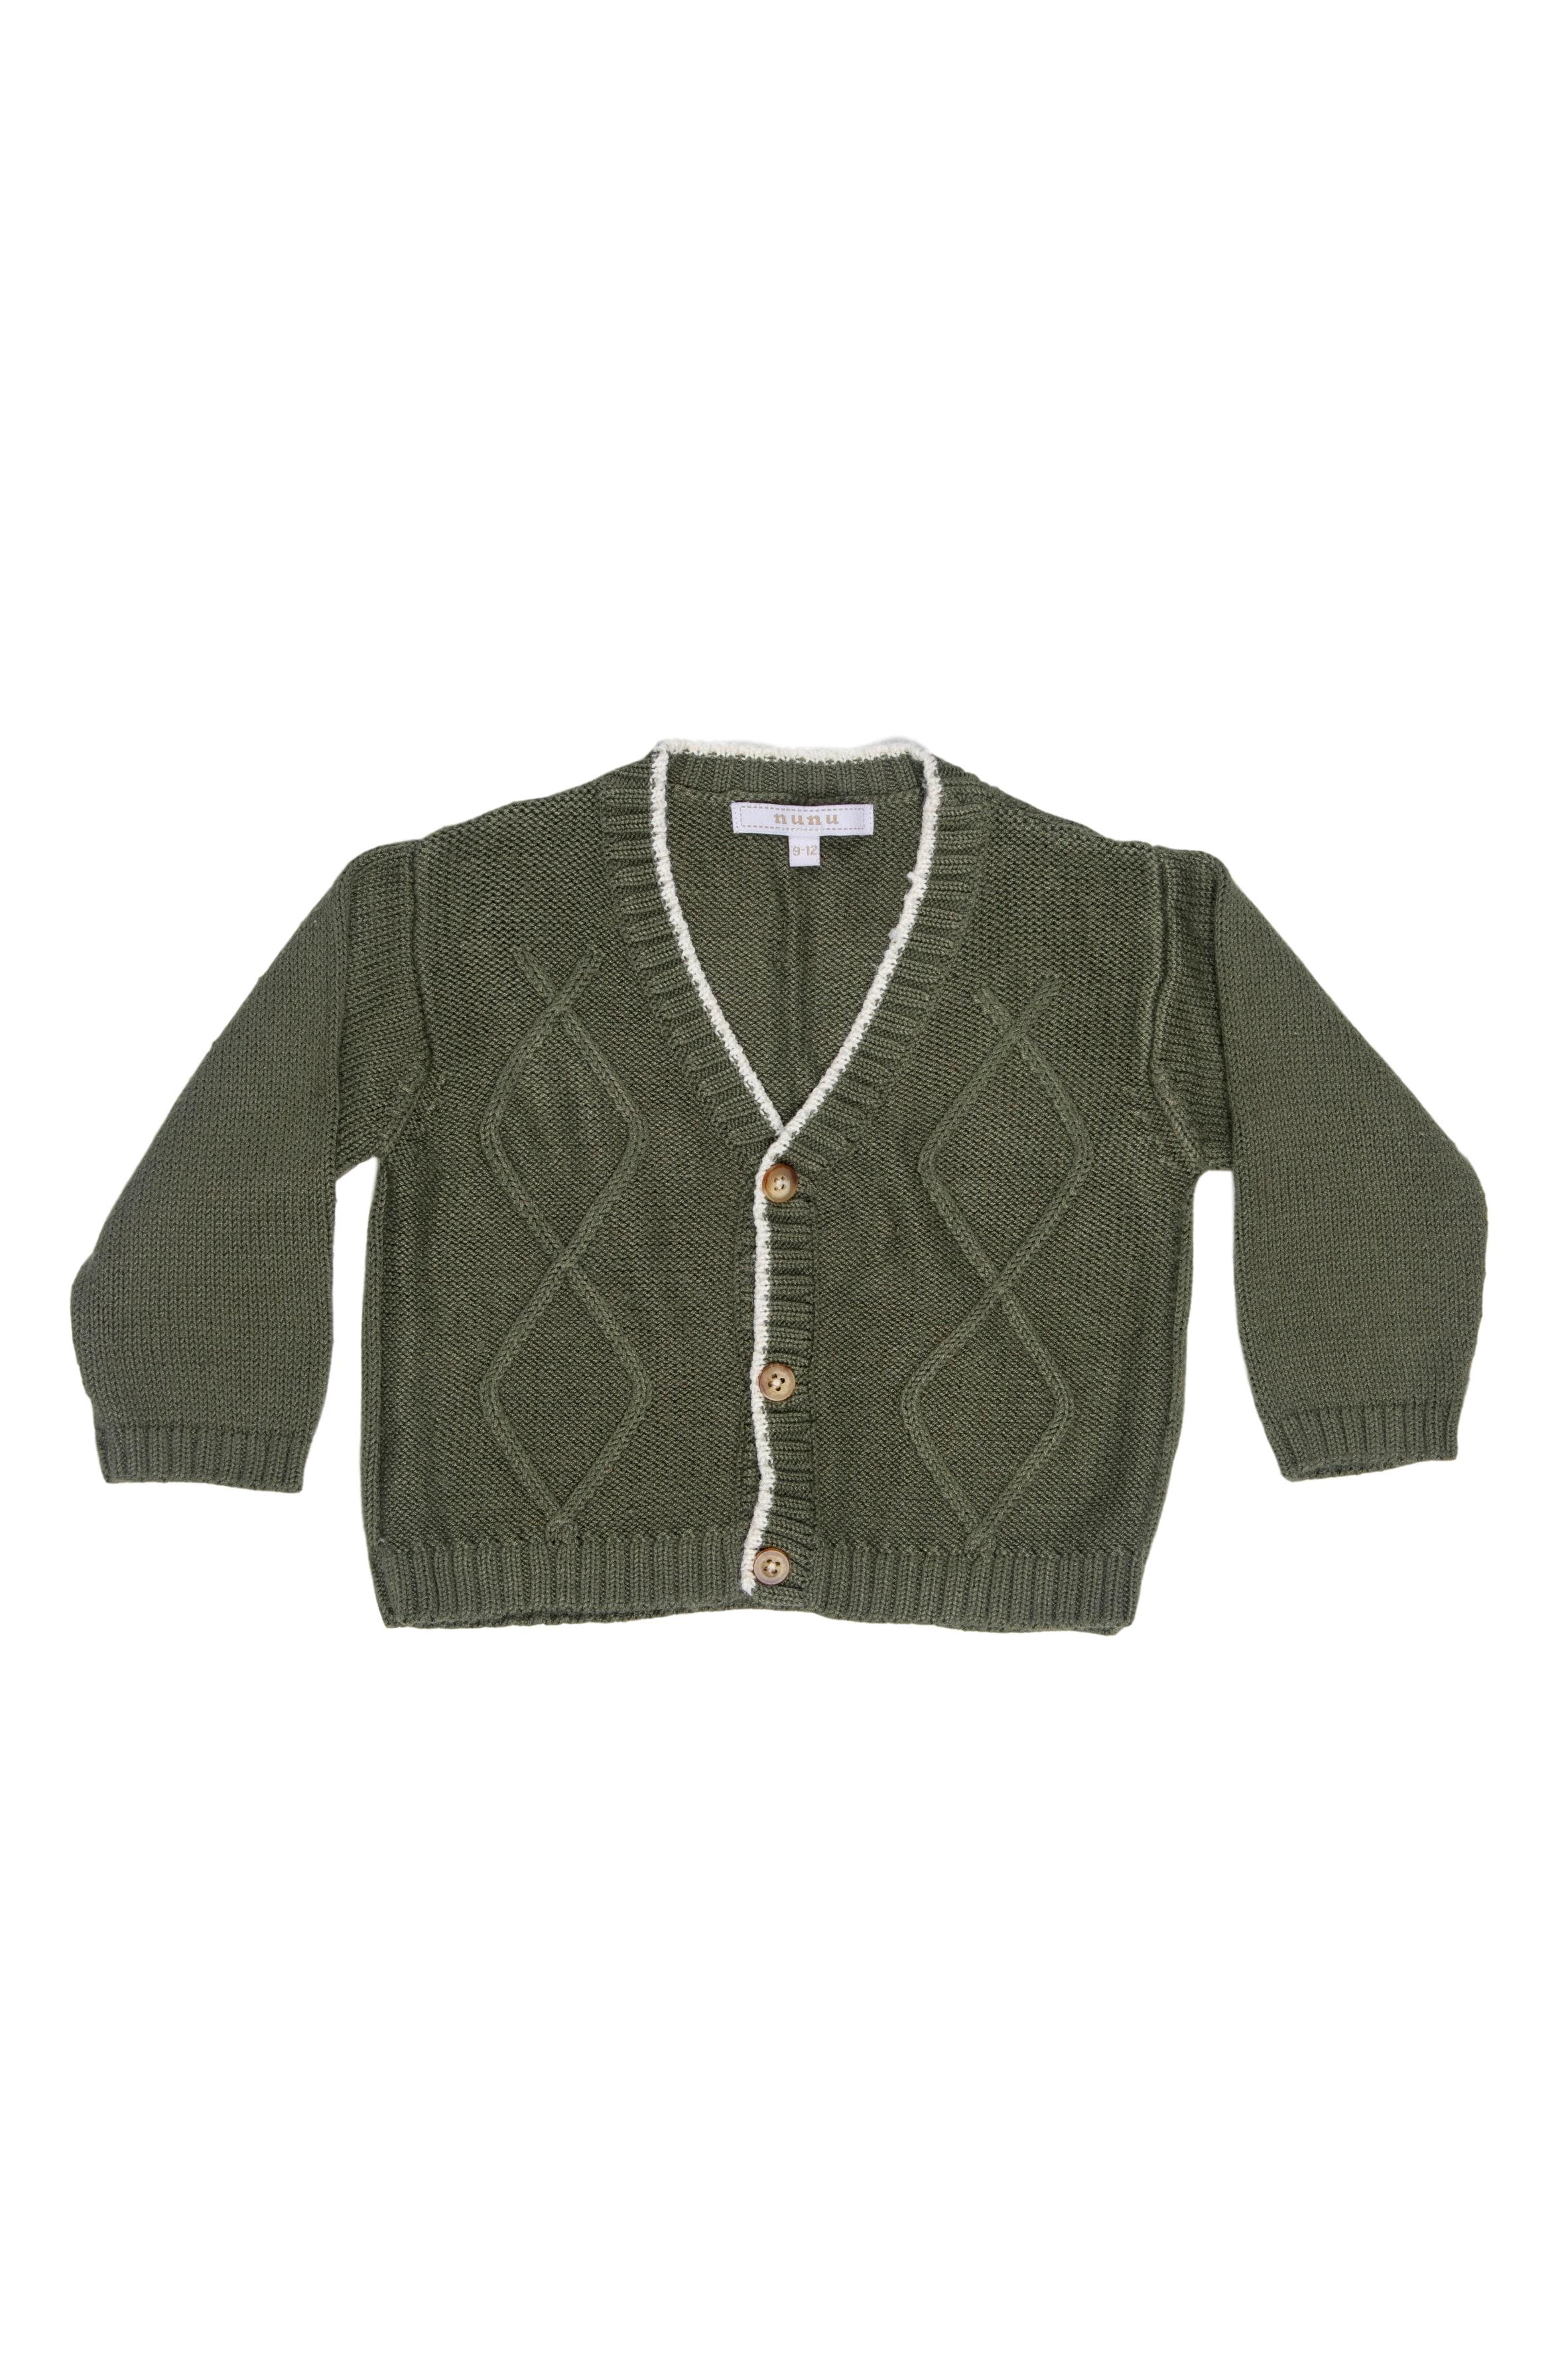 Chompa verde militar tejida 100% algodón - Nunu